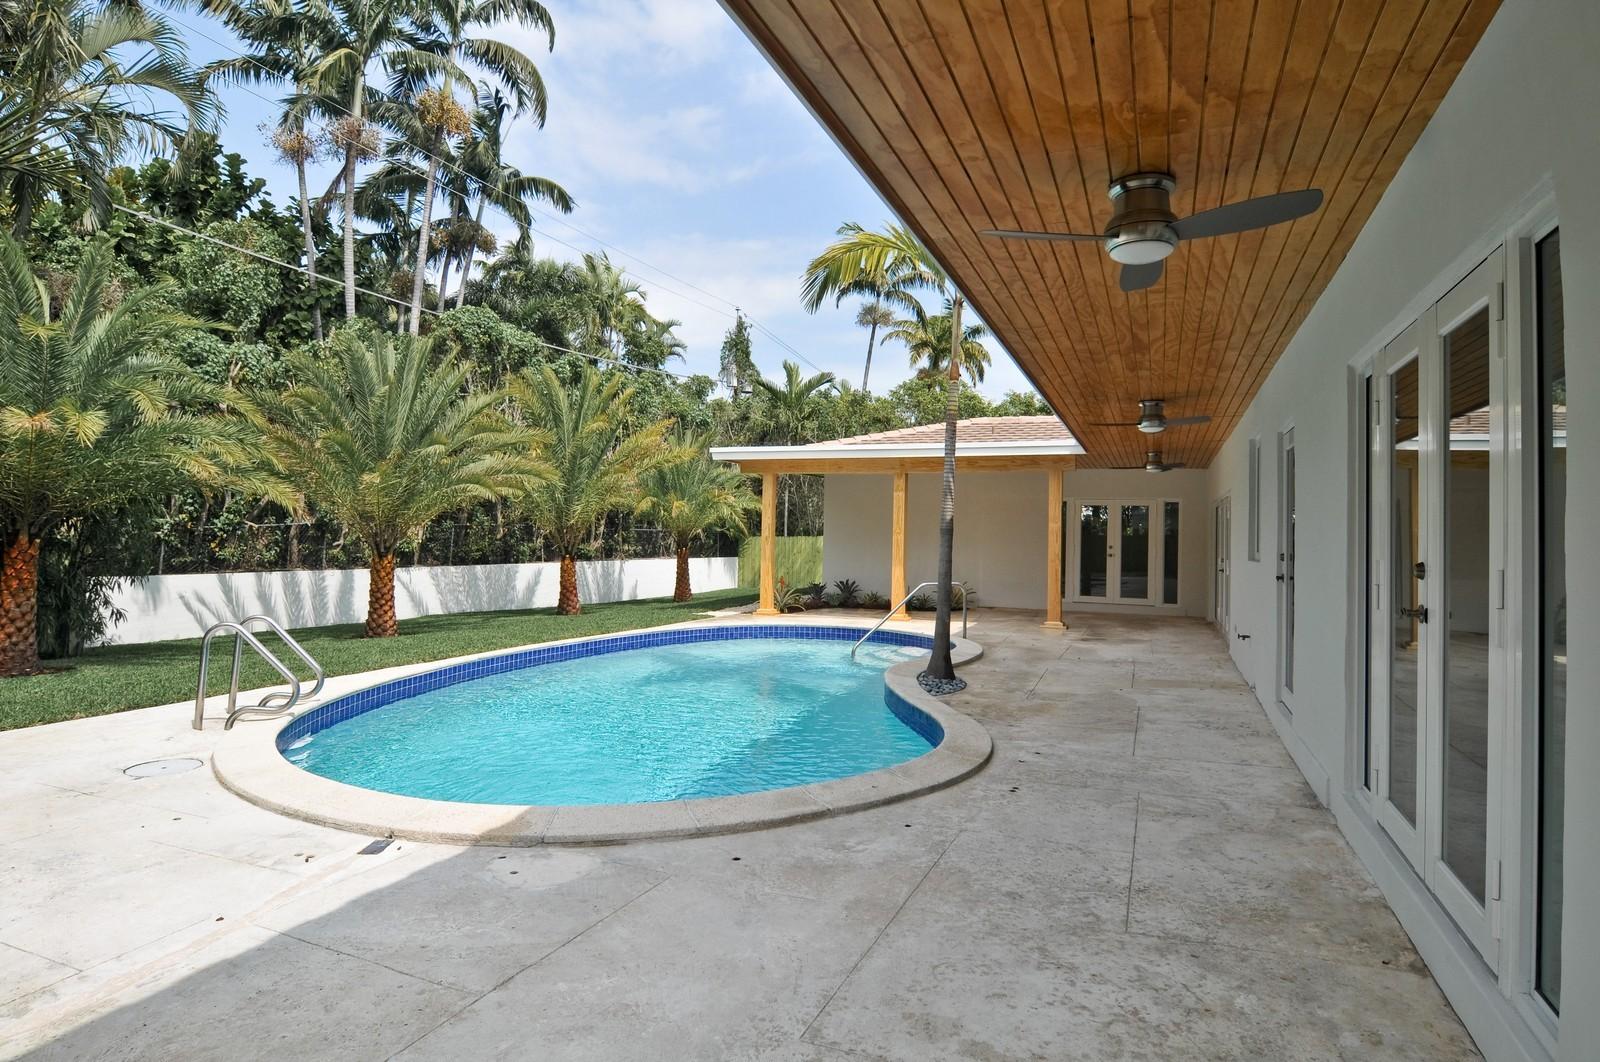 Real Estate Photography - 3645 Battersea, Miami, FL, 33133 - Pool